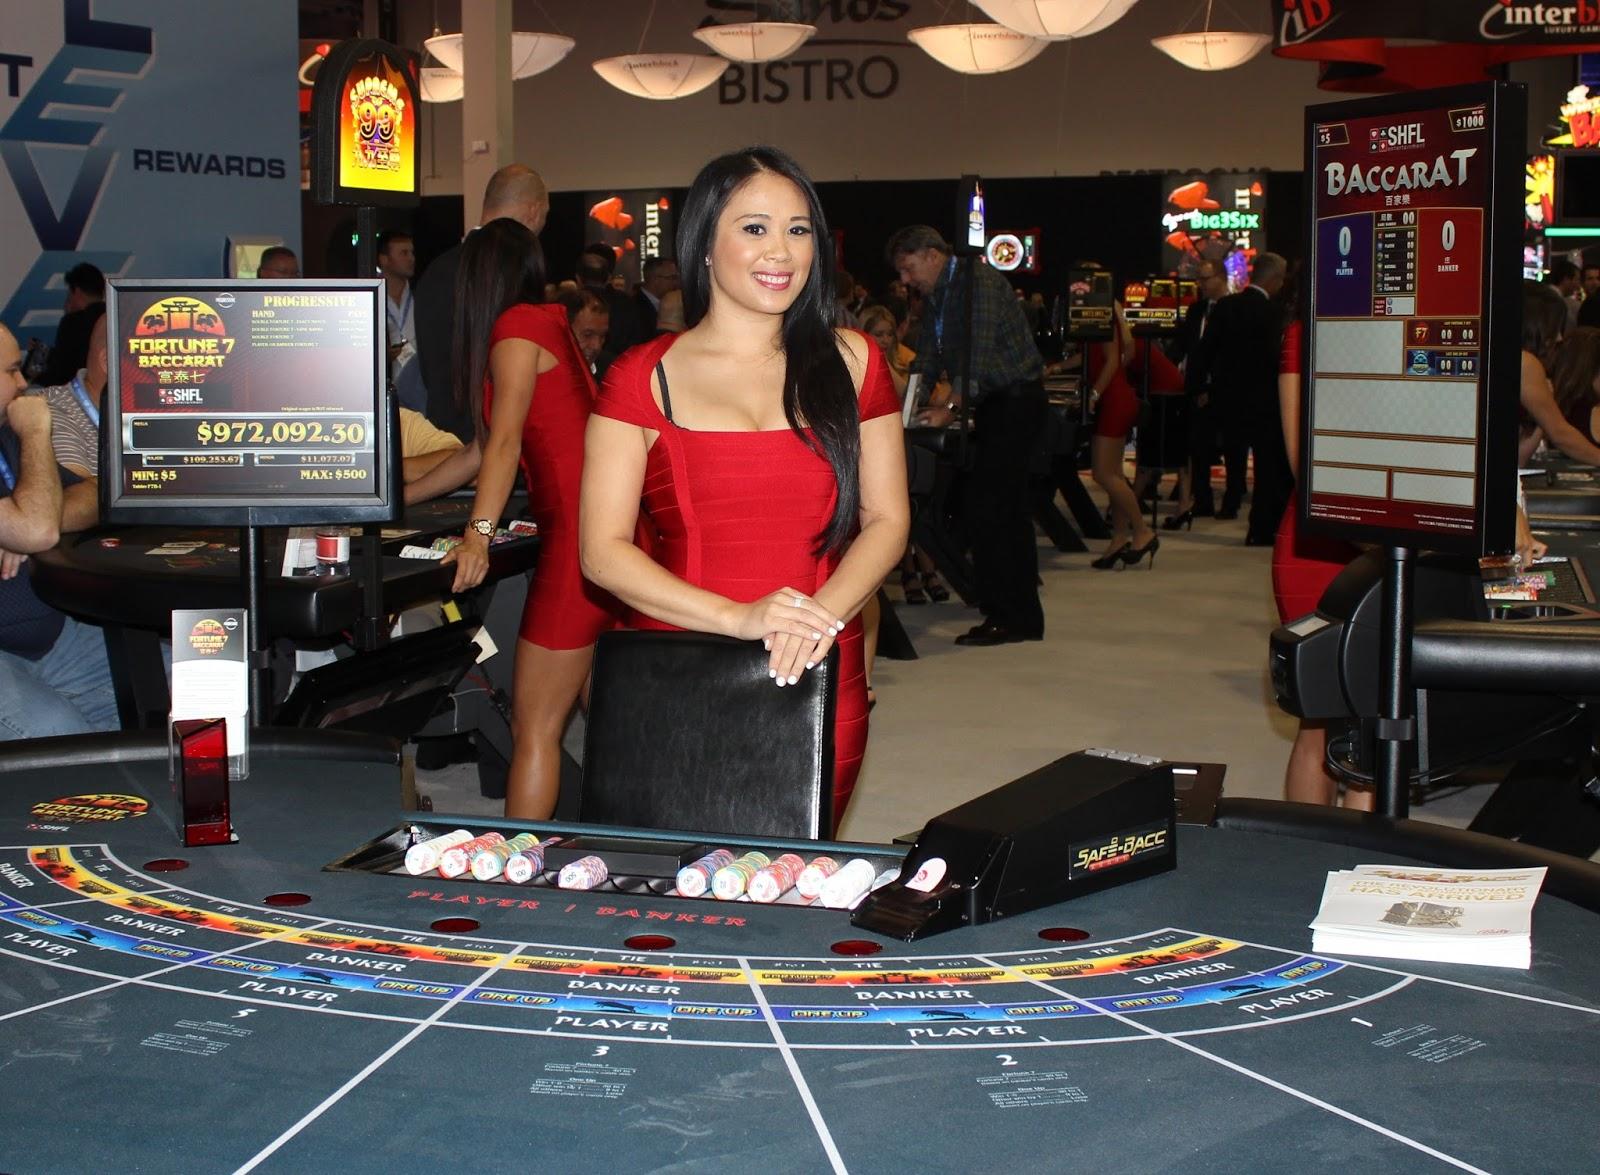 jackpot party casino slots bonus collector